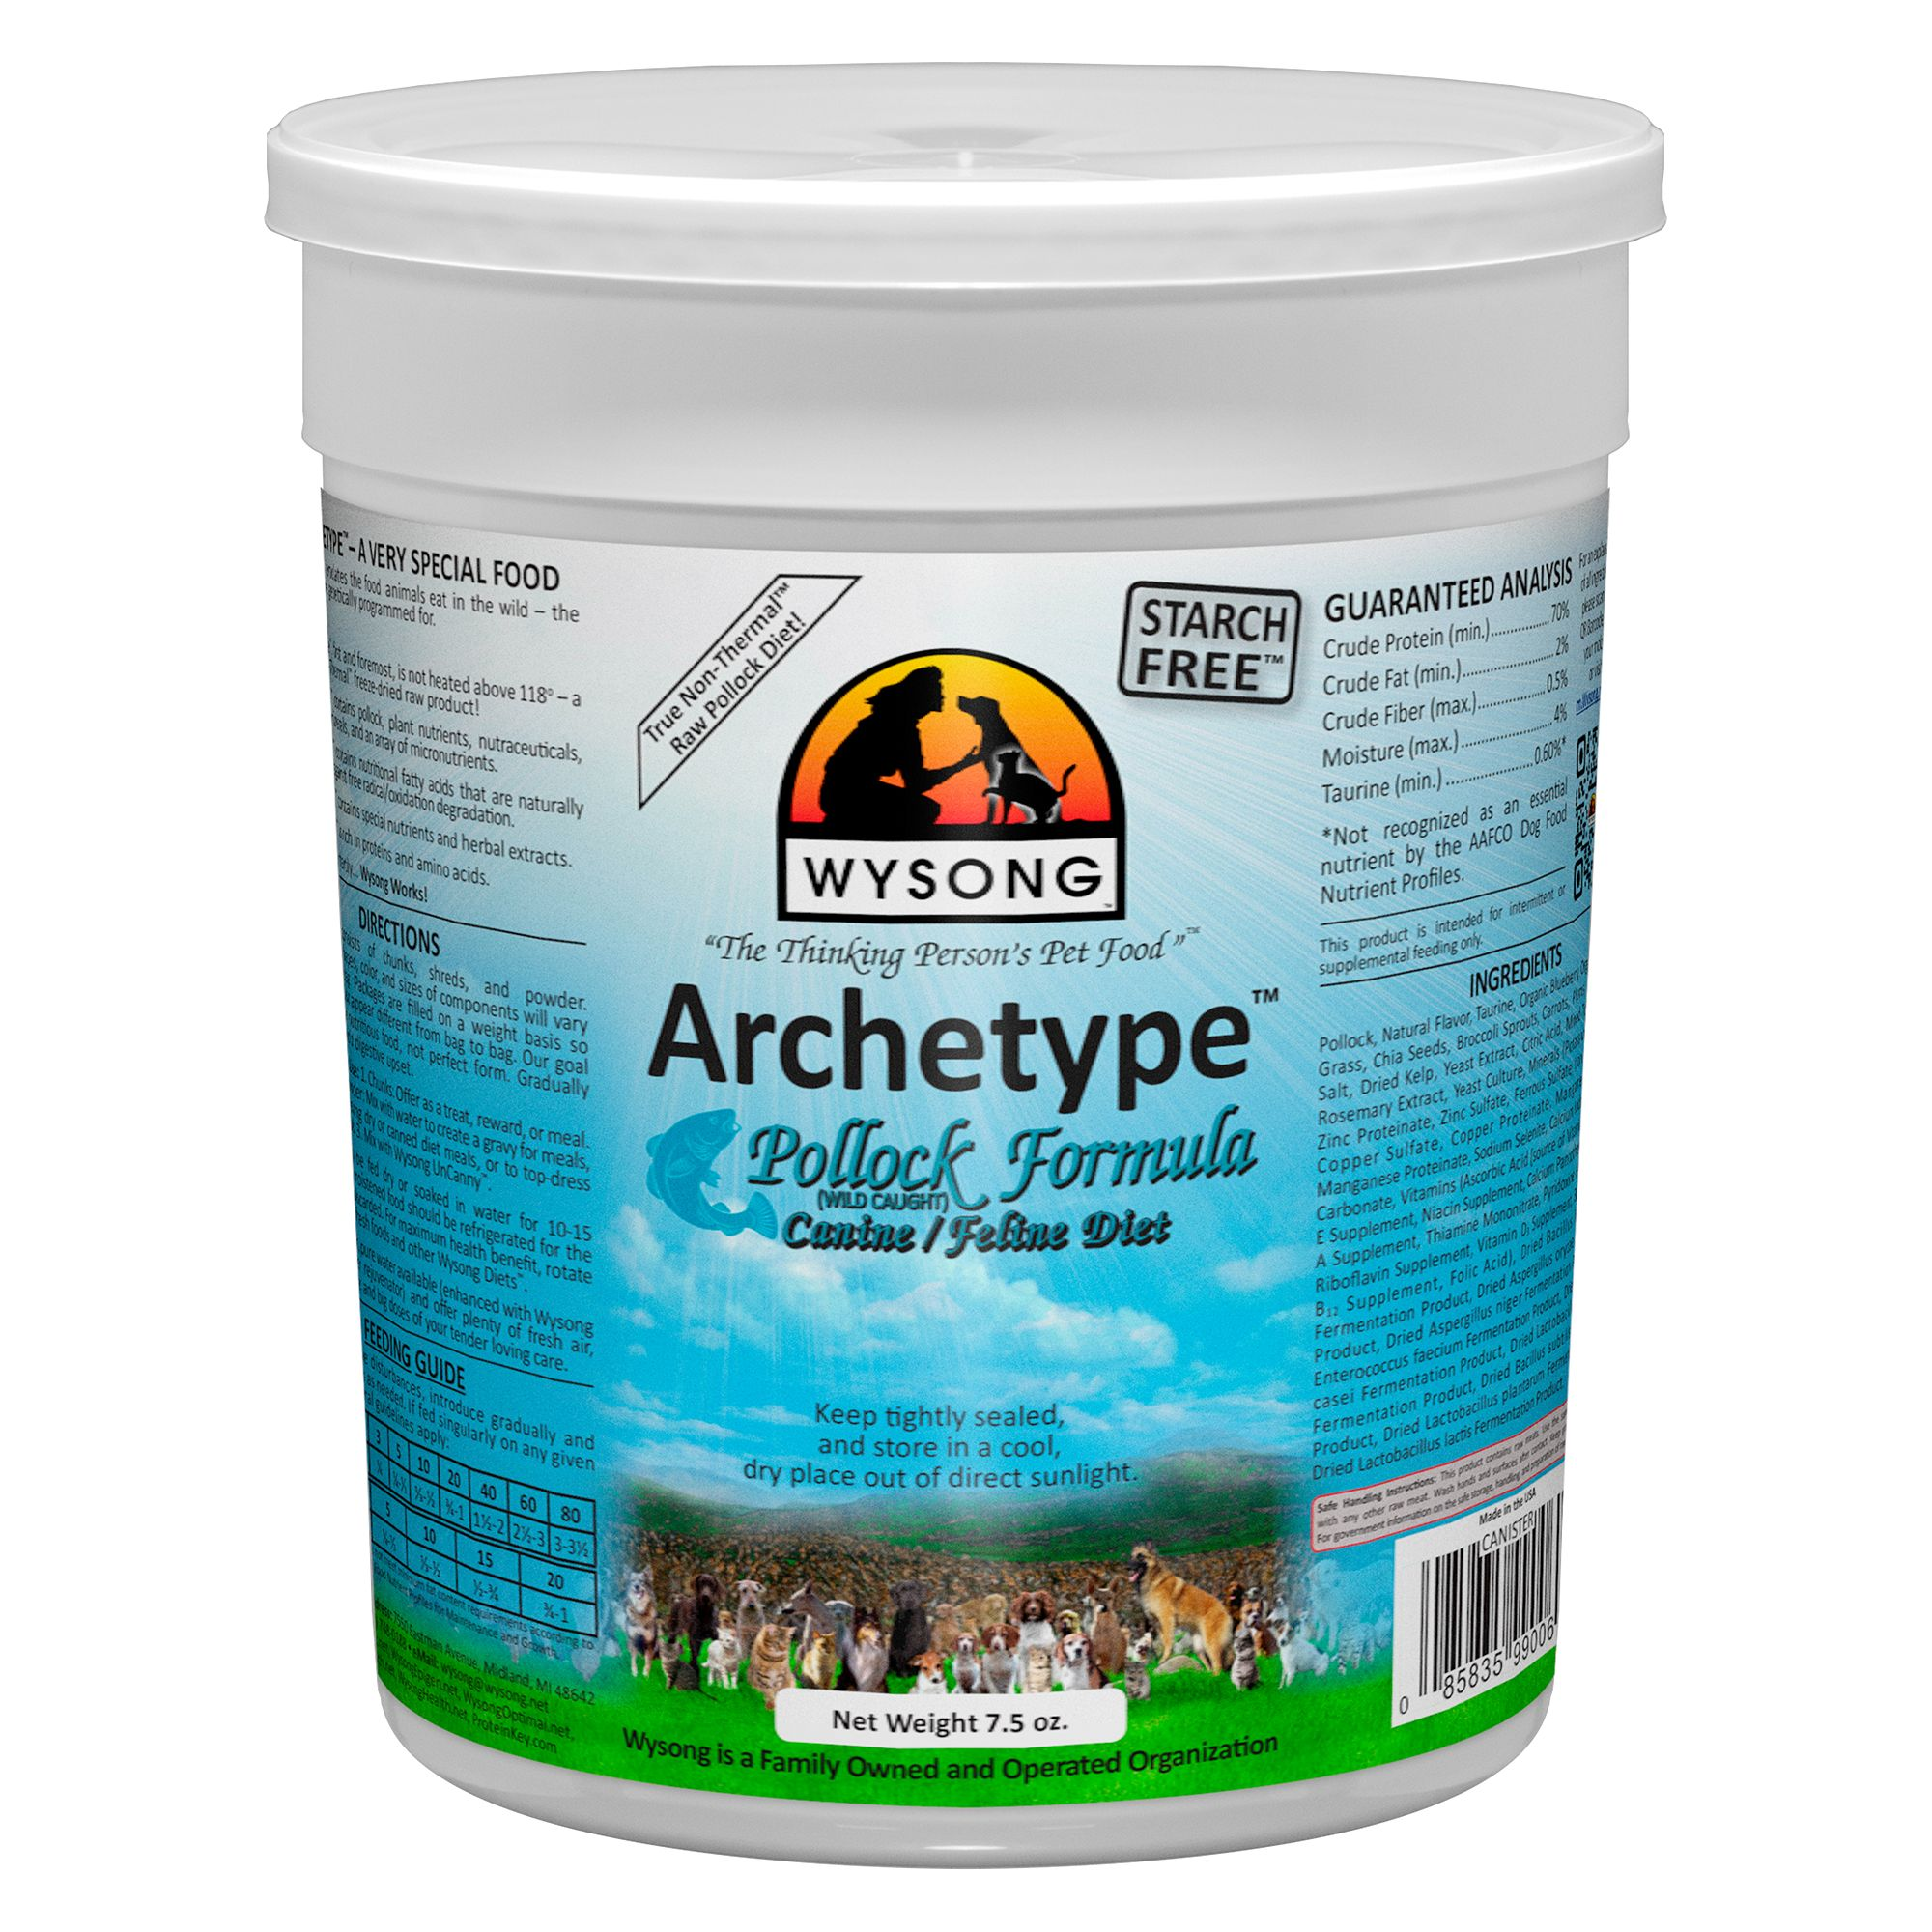 Wysong Archetype Freeze Dried Raw Dog and Cat Food - Pollock size: 7.5 Oz 5270599